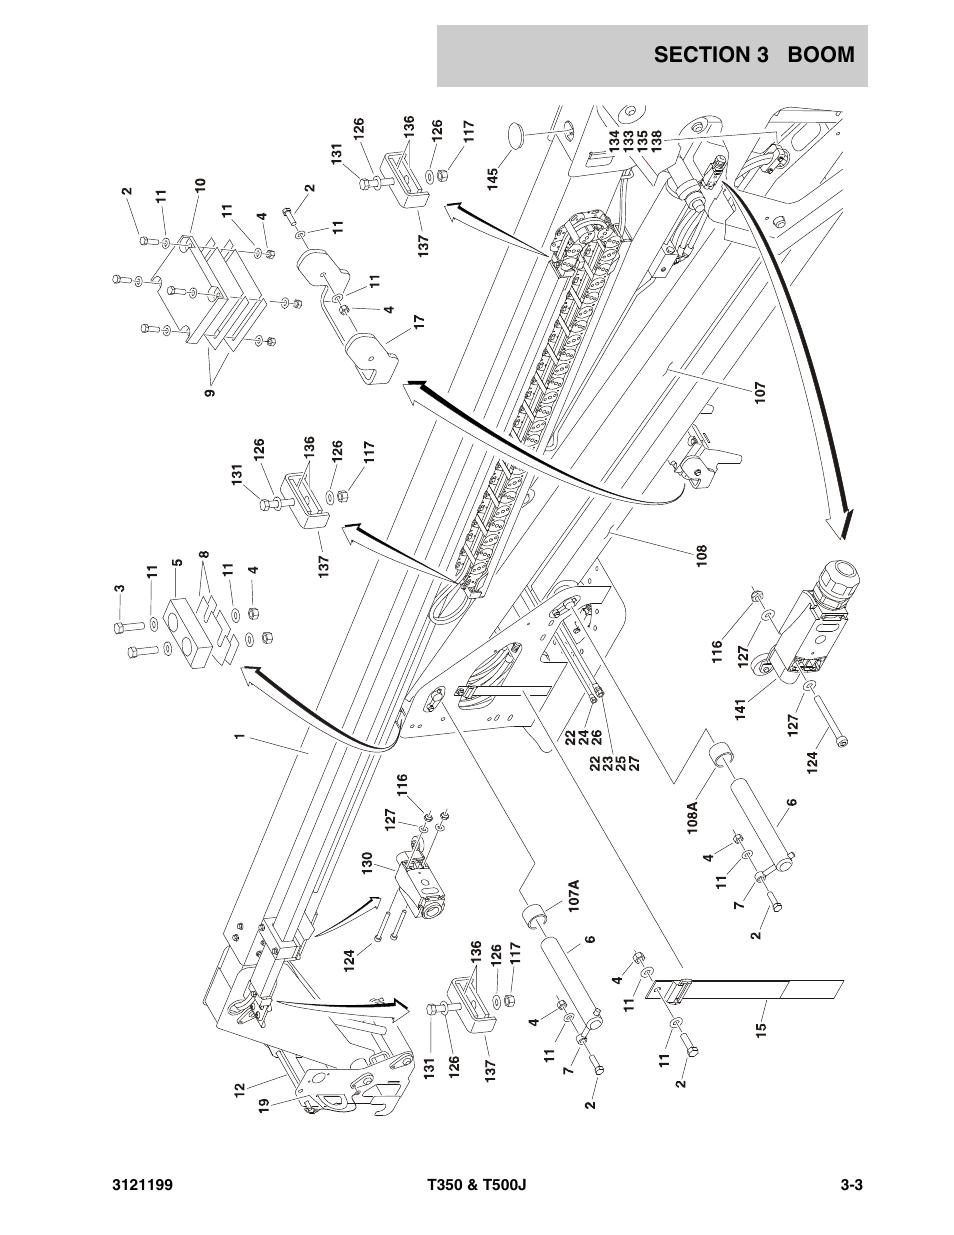 Jlg T500j Parts Manual User Manual